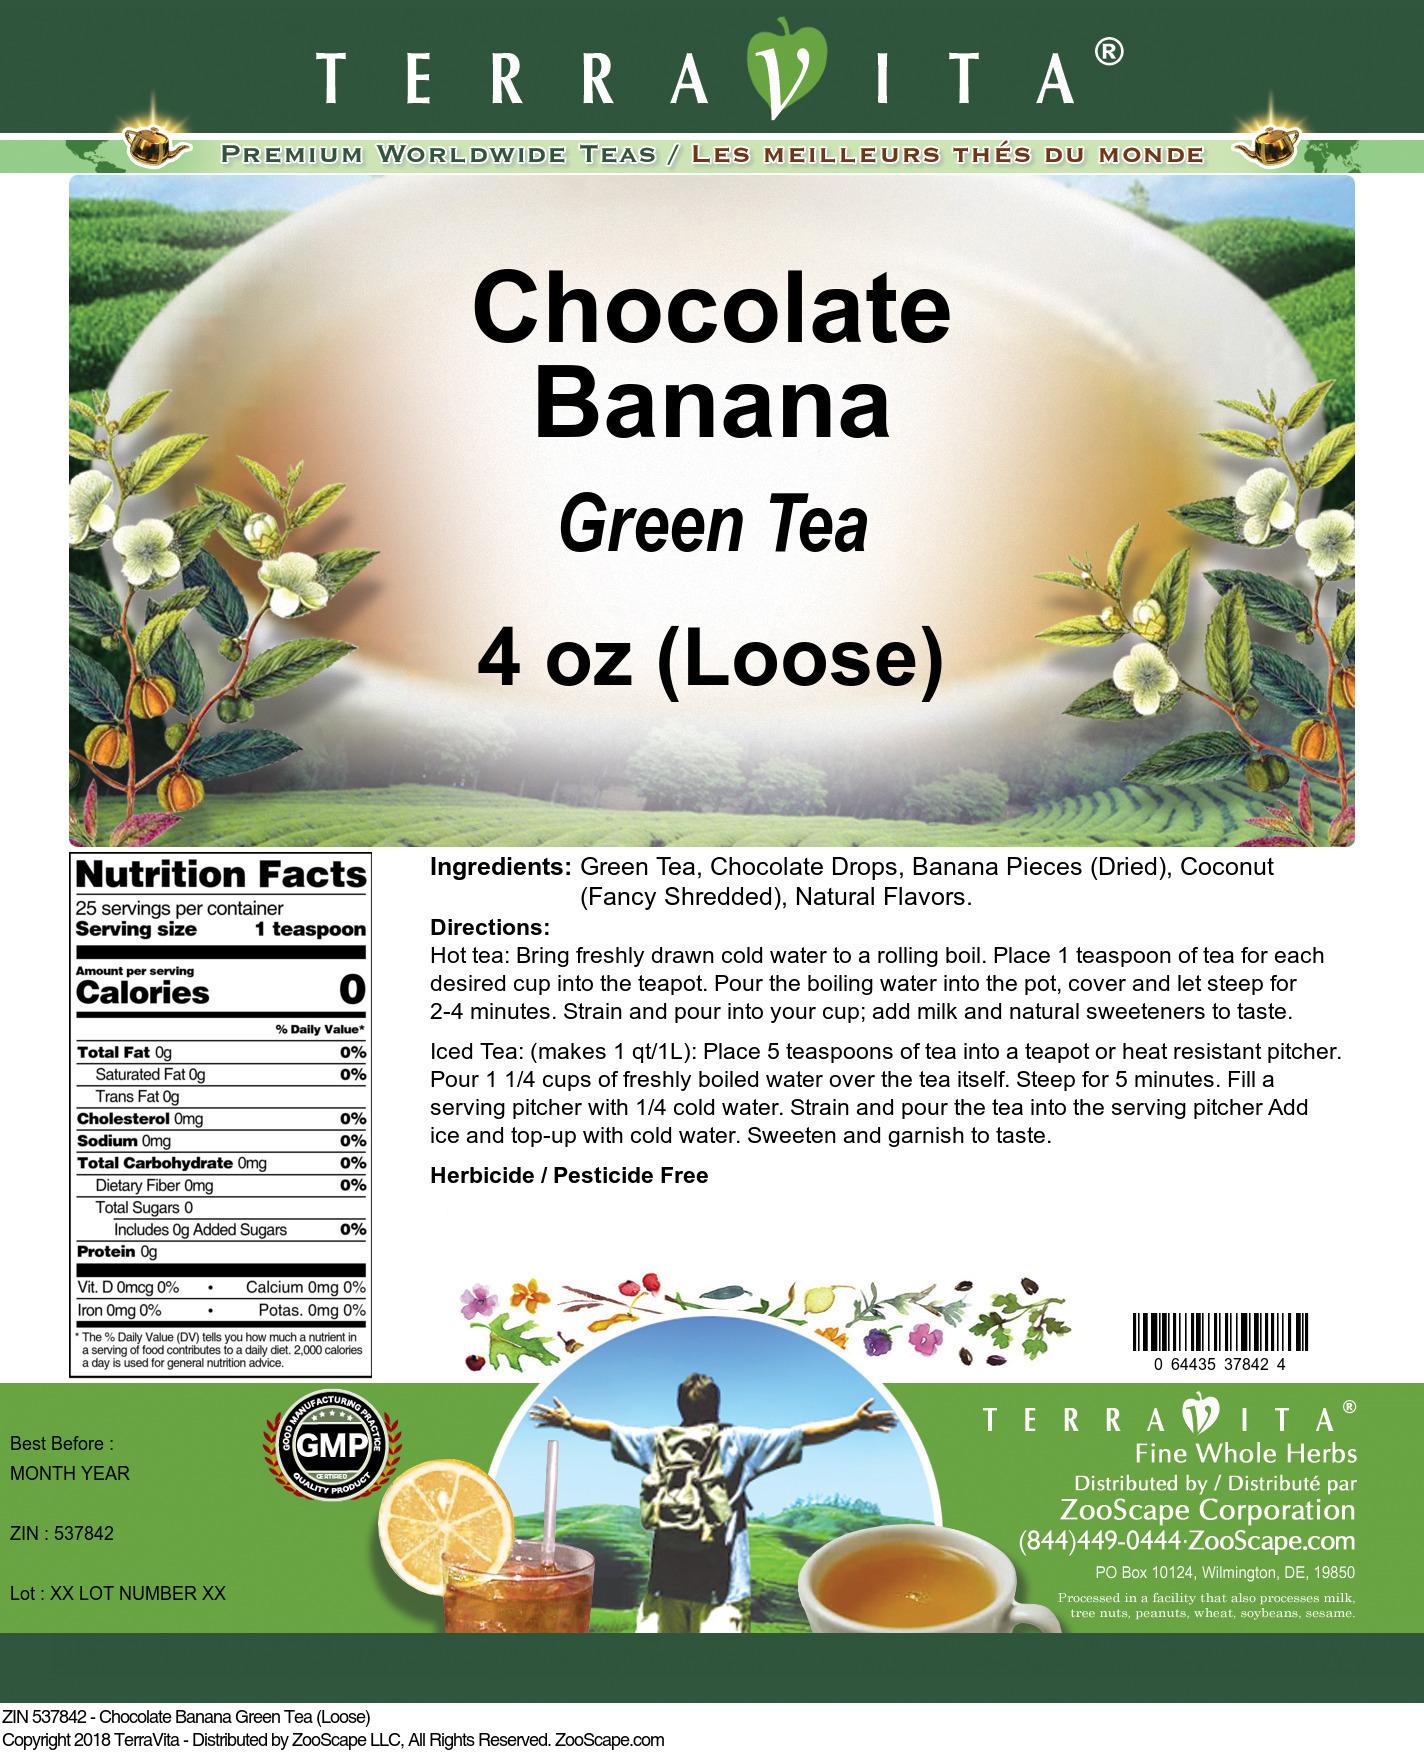 Chocolate Banana Green Tea (Loose)